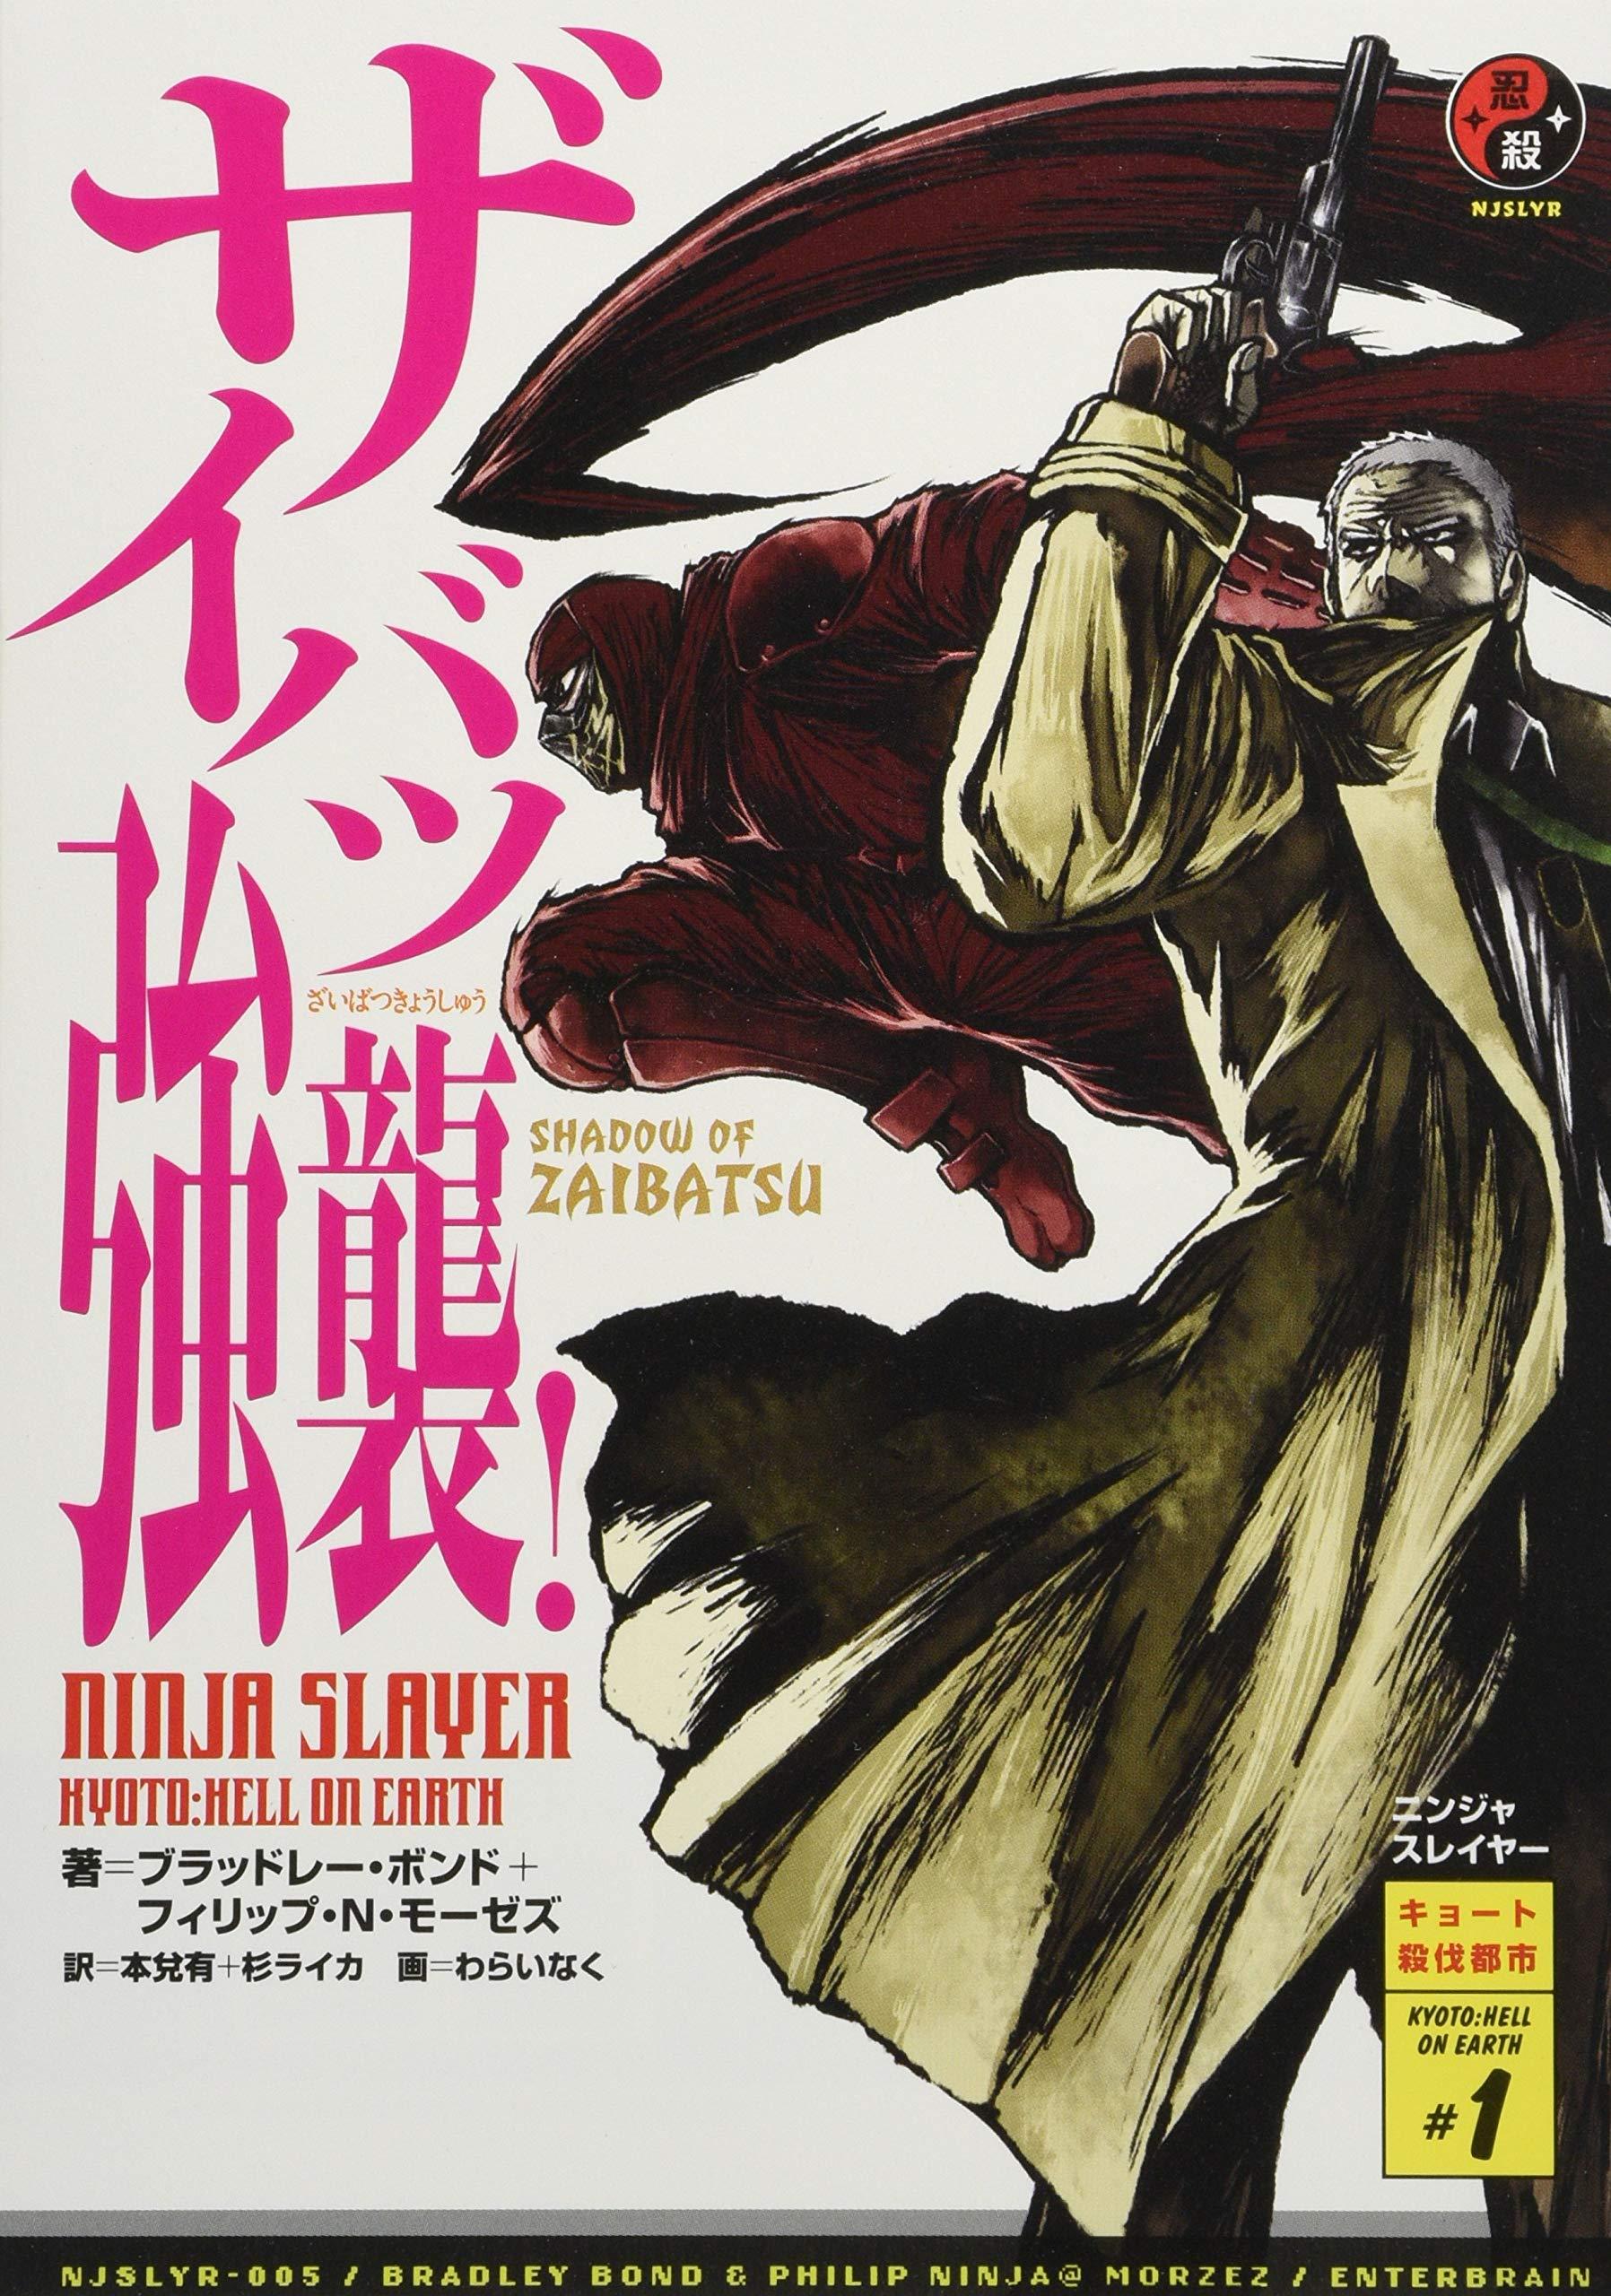 Ninja Slayer Zai Vatu Assault! (2013) ISBN: 4047289450 ...